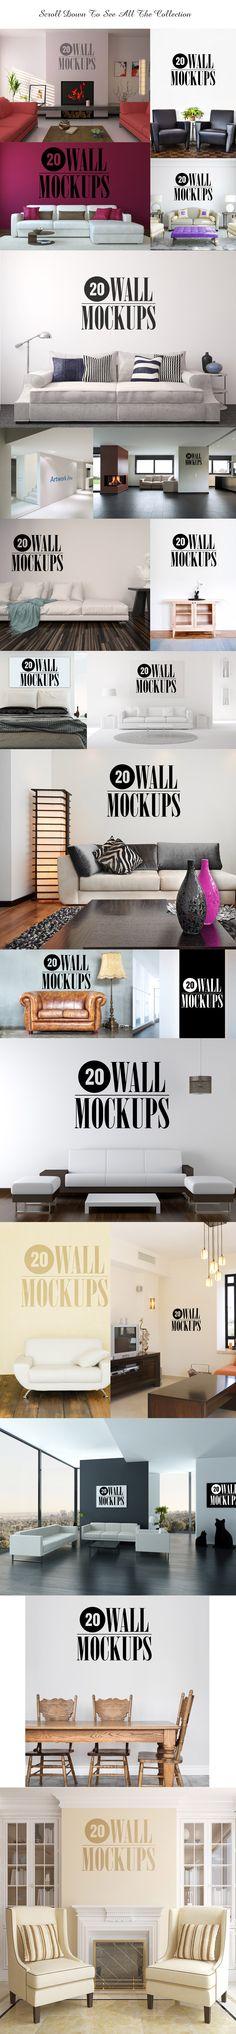 20 Wall Art Mockups by Limedot on Creative Market